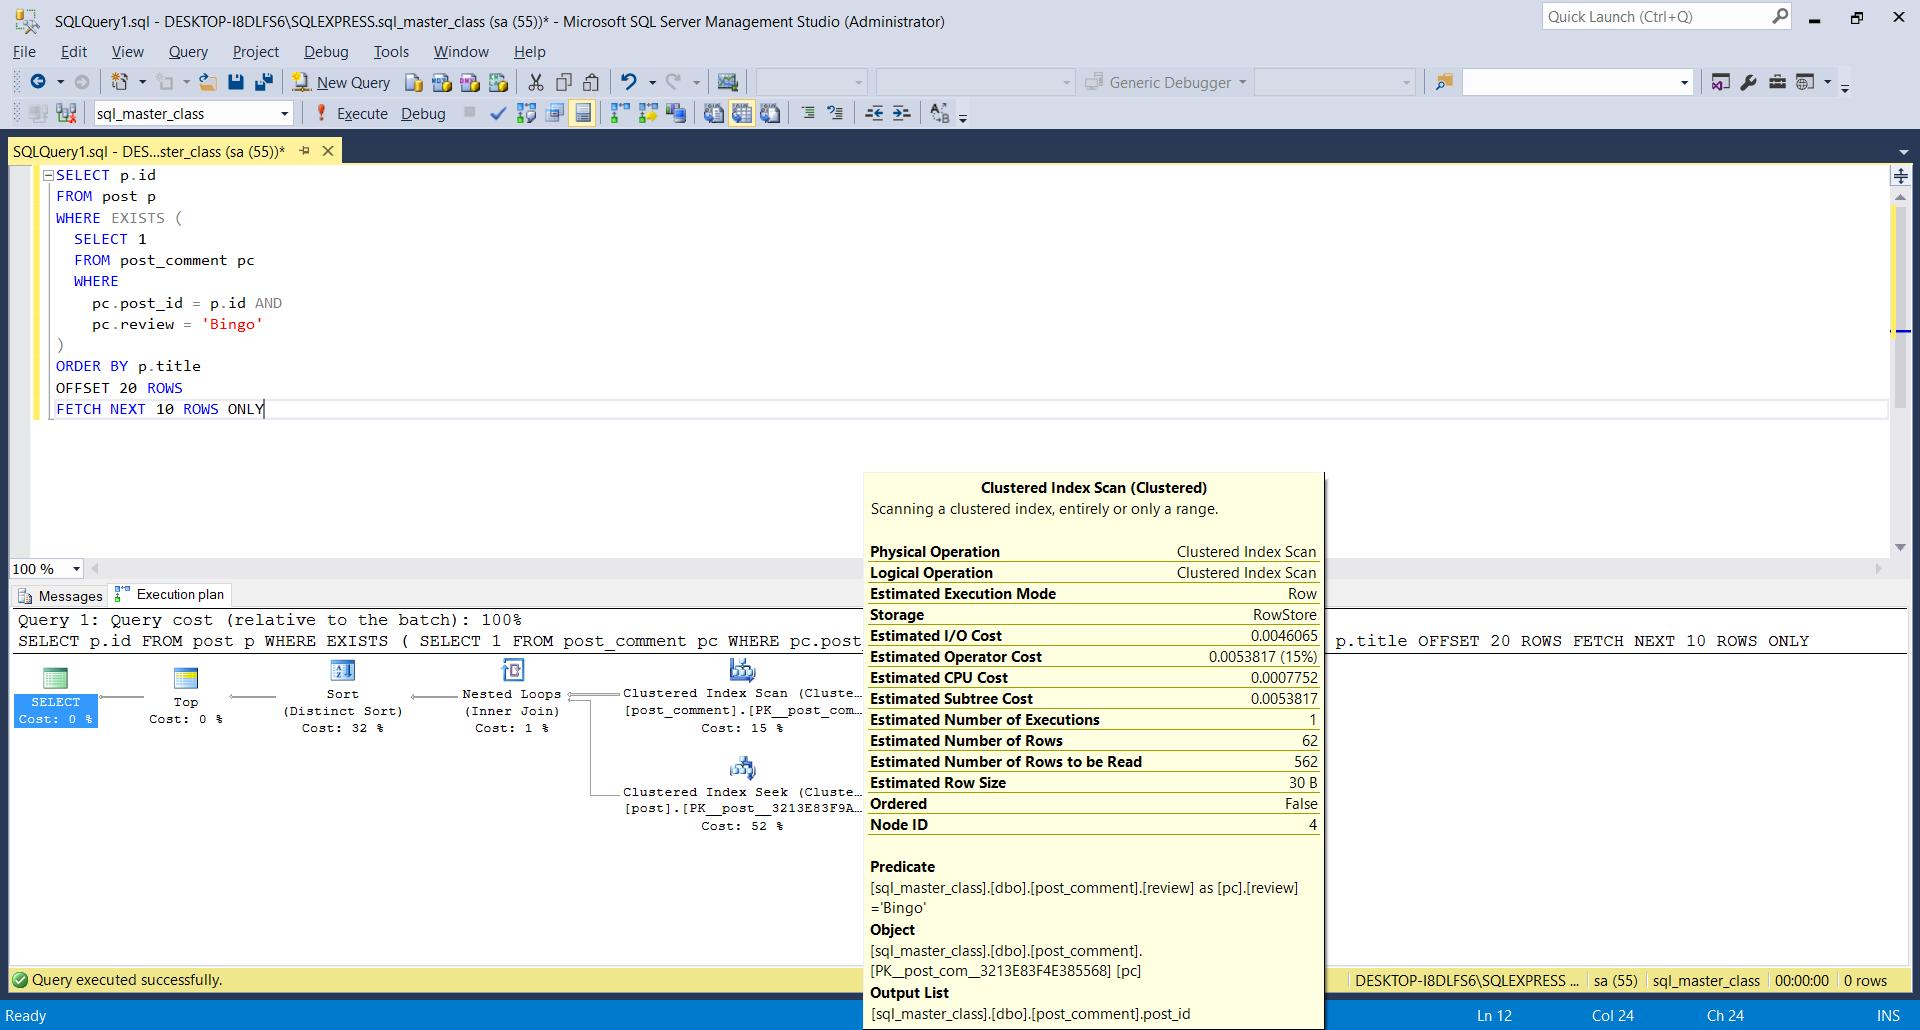 SQL Server Estimated Execution Plan